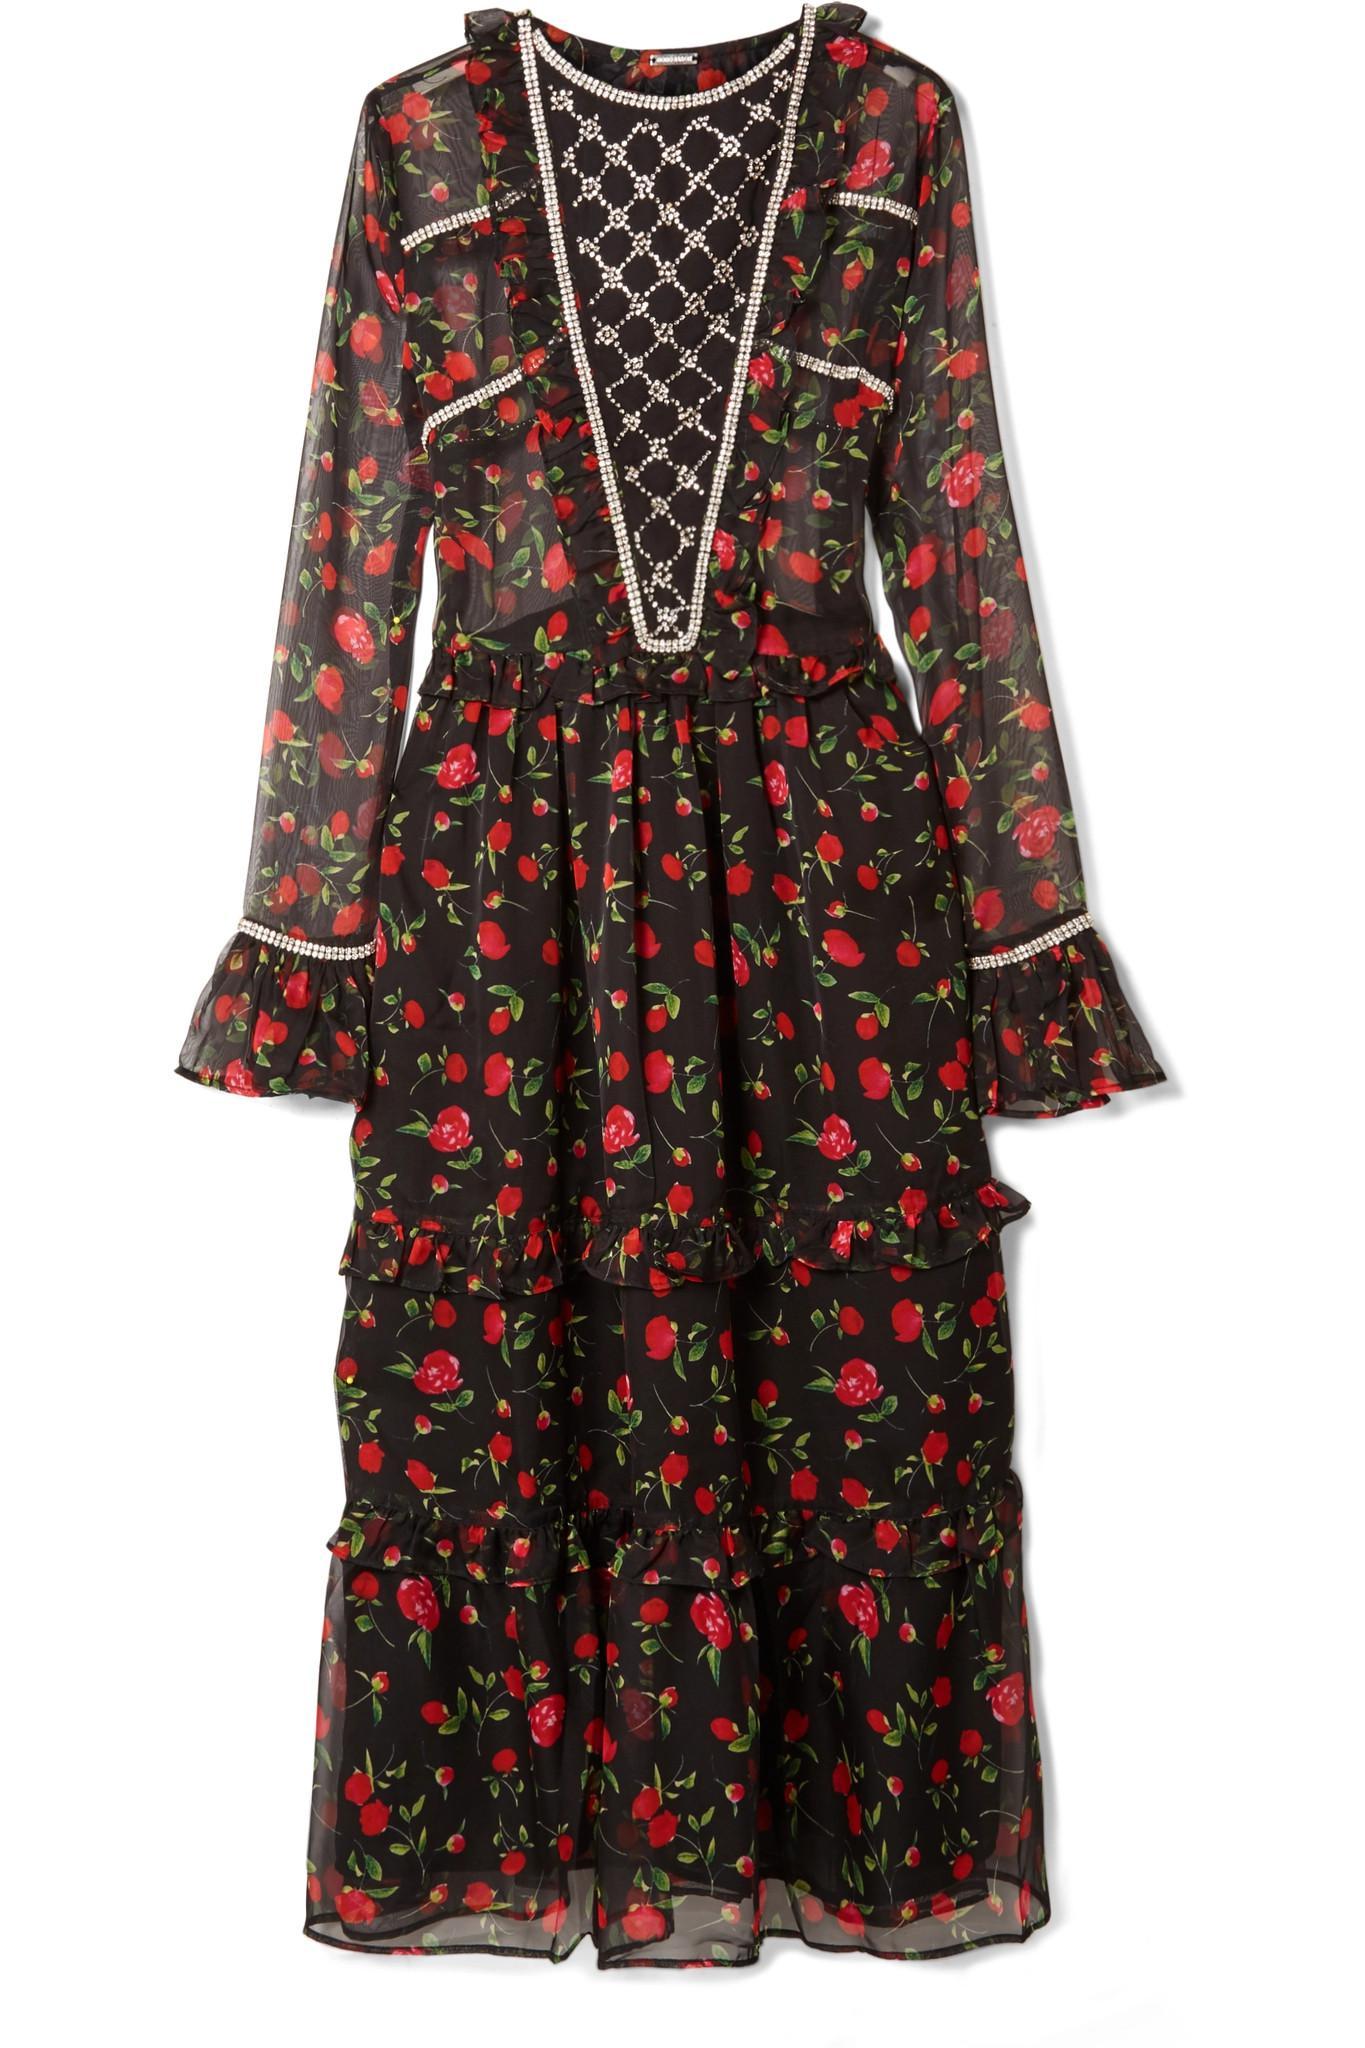 Crystal-embellished Ruffled Floral-print Chiffon Midi Dress - Black Dodo Bar Or Kj61uE9